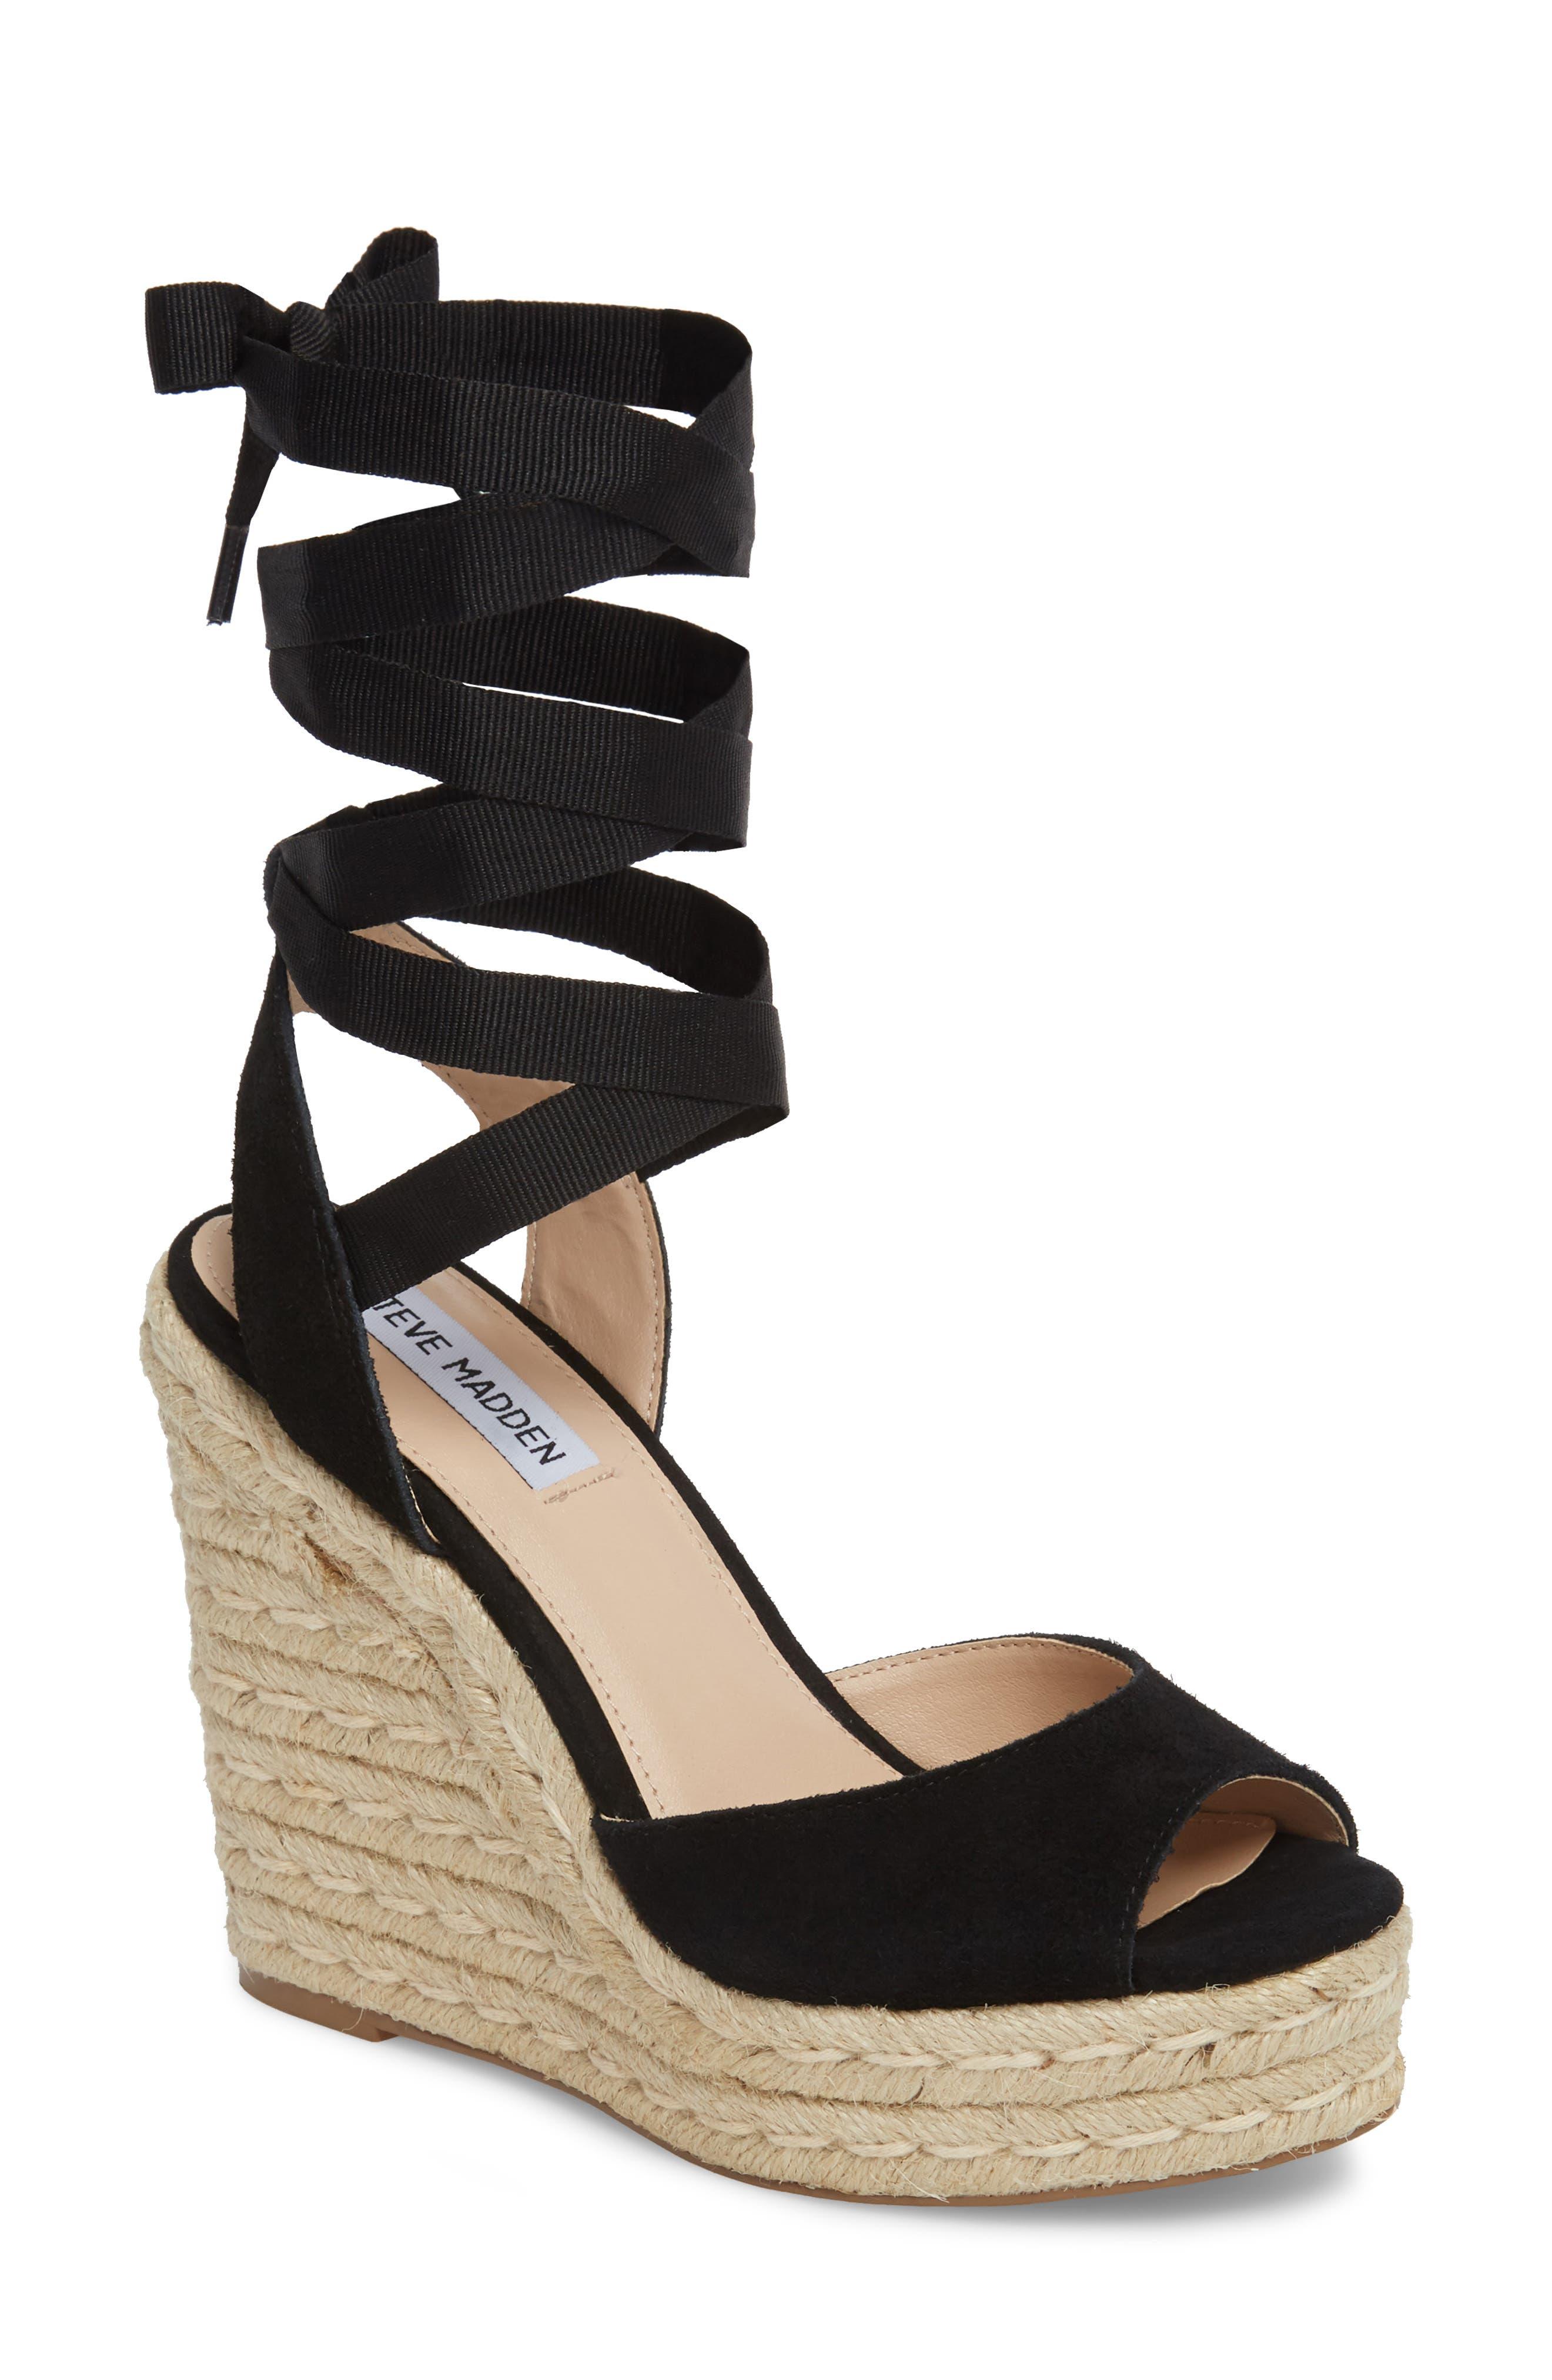 Secret Wedge Wraparound Sandal,                         Main,                         color, Black Suede